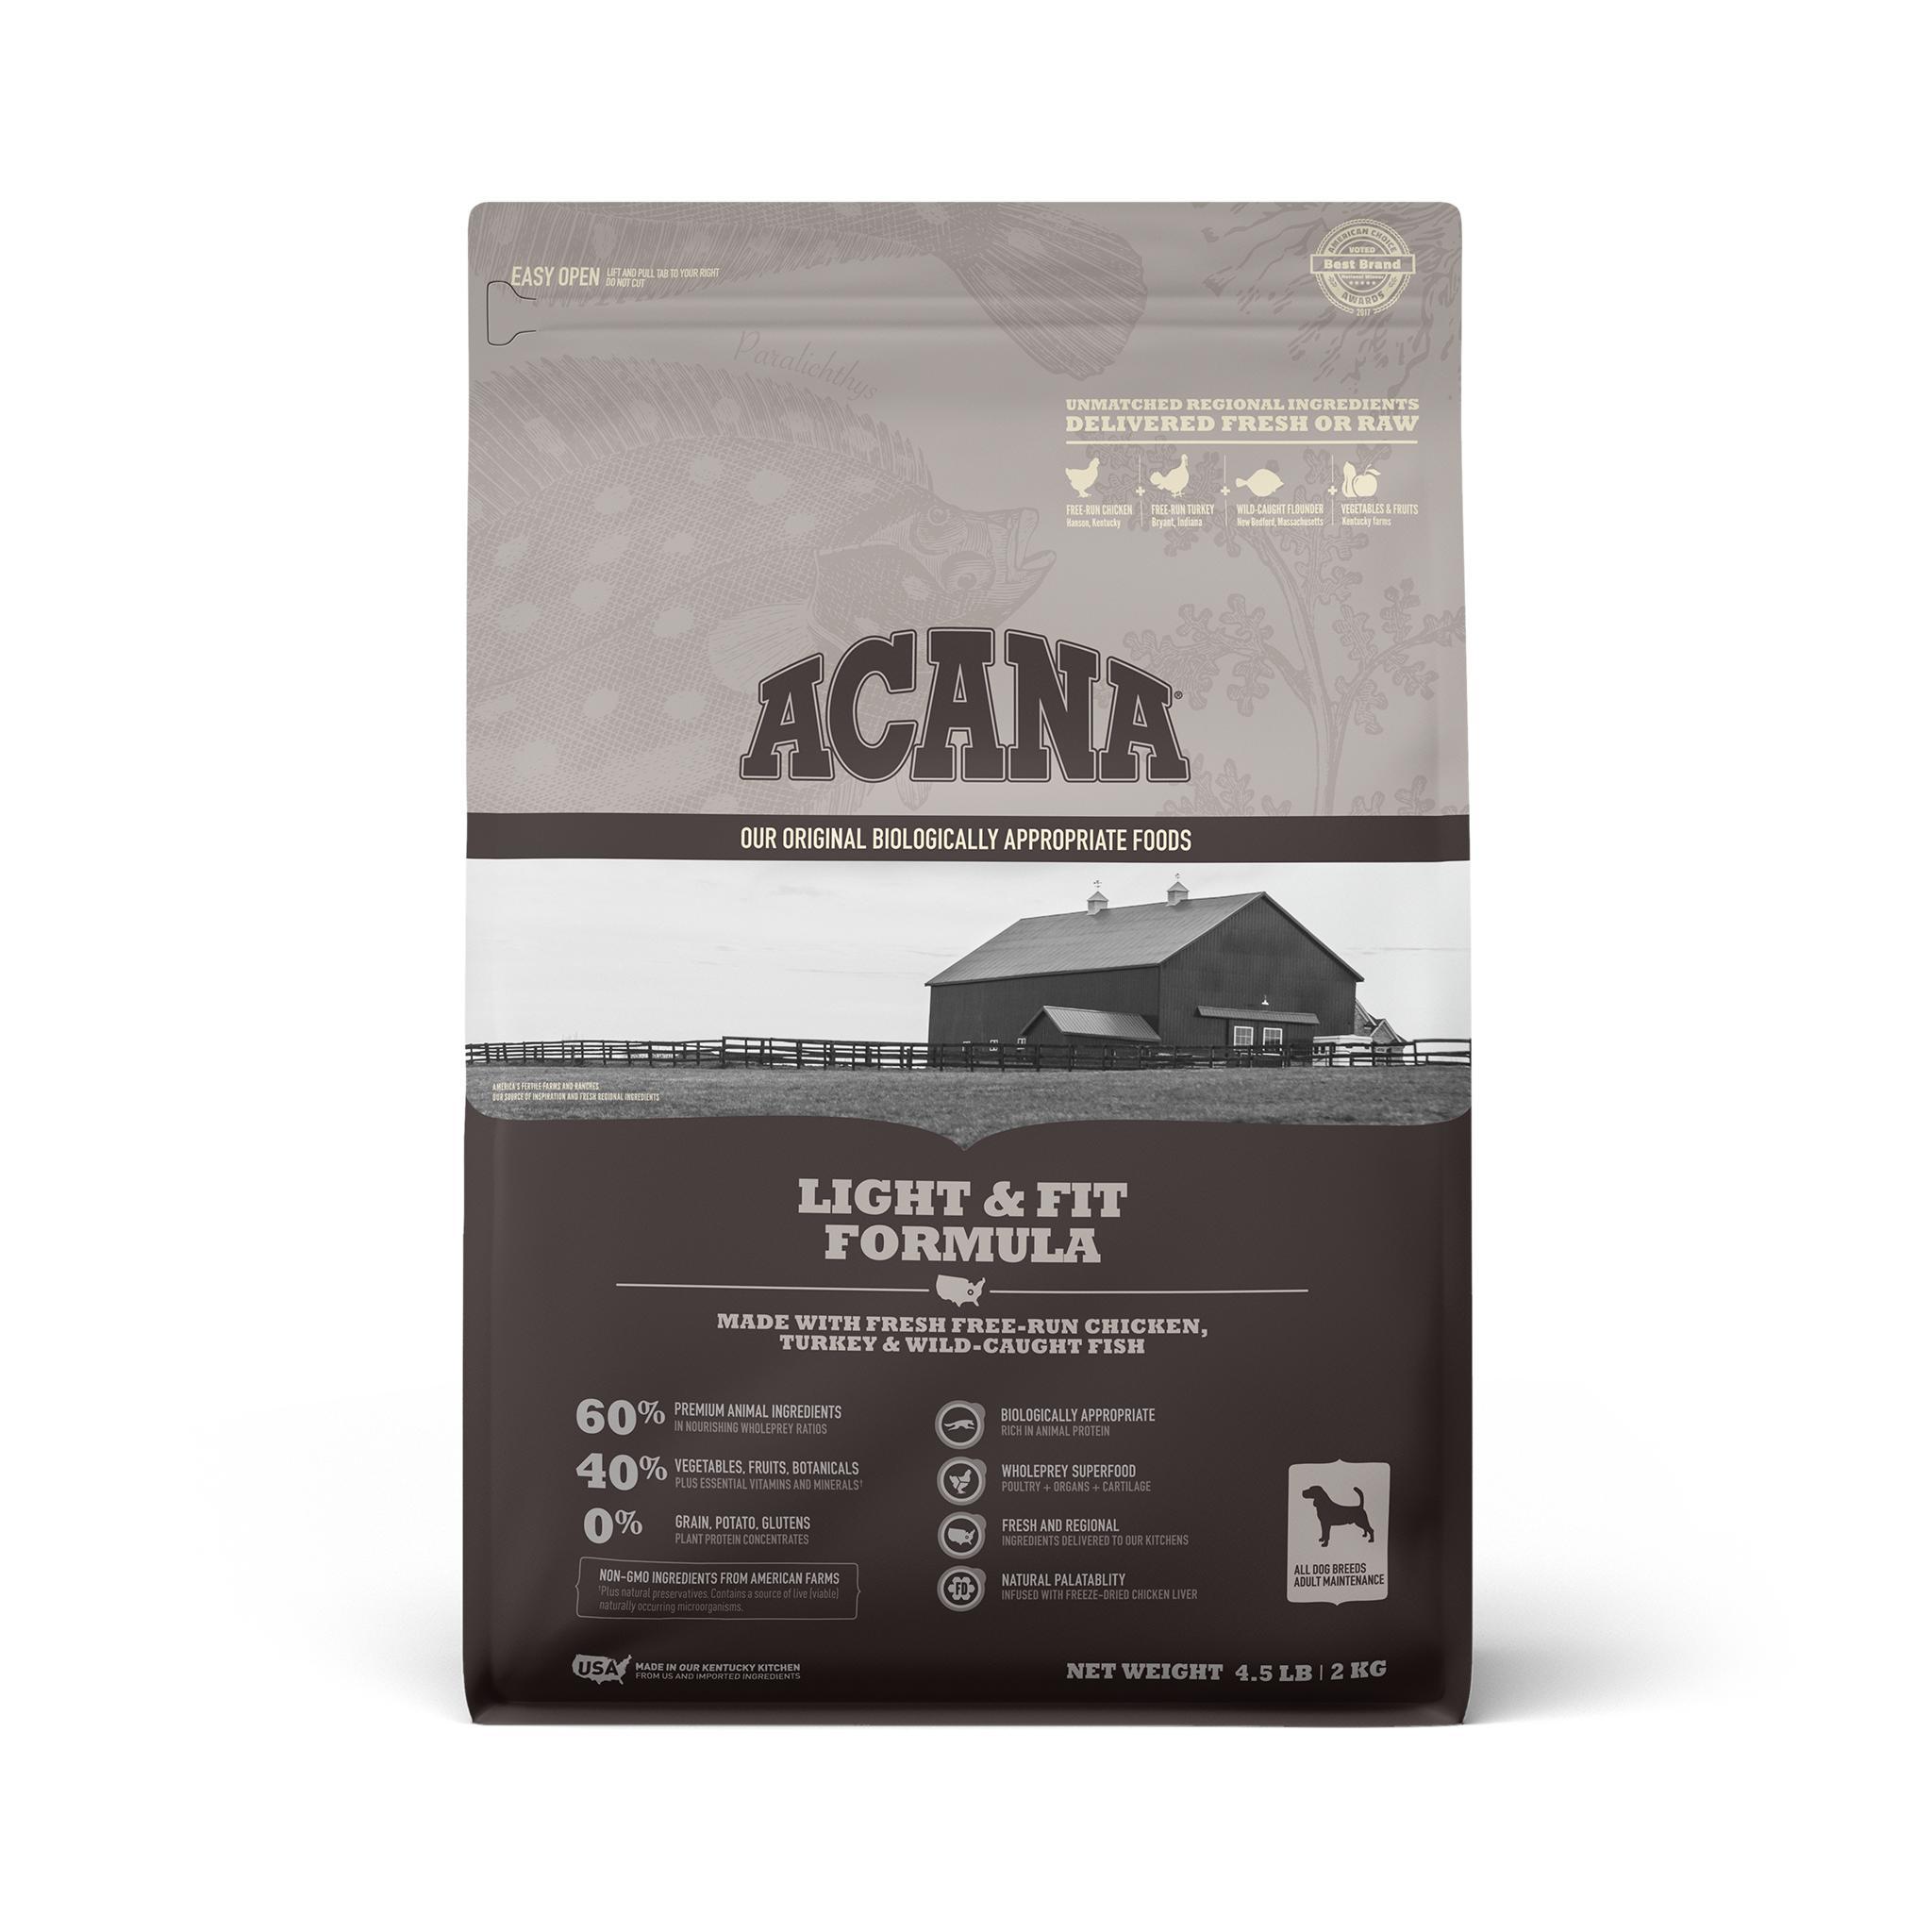 ACANA Light & Fit Grain-Free Dry Dog Food, 4.5-lb